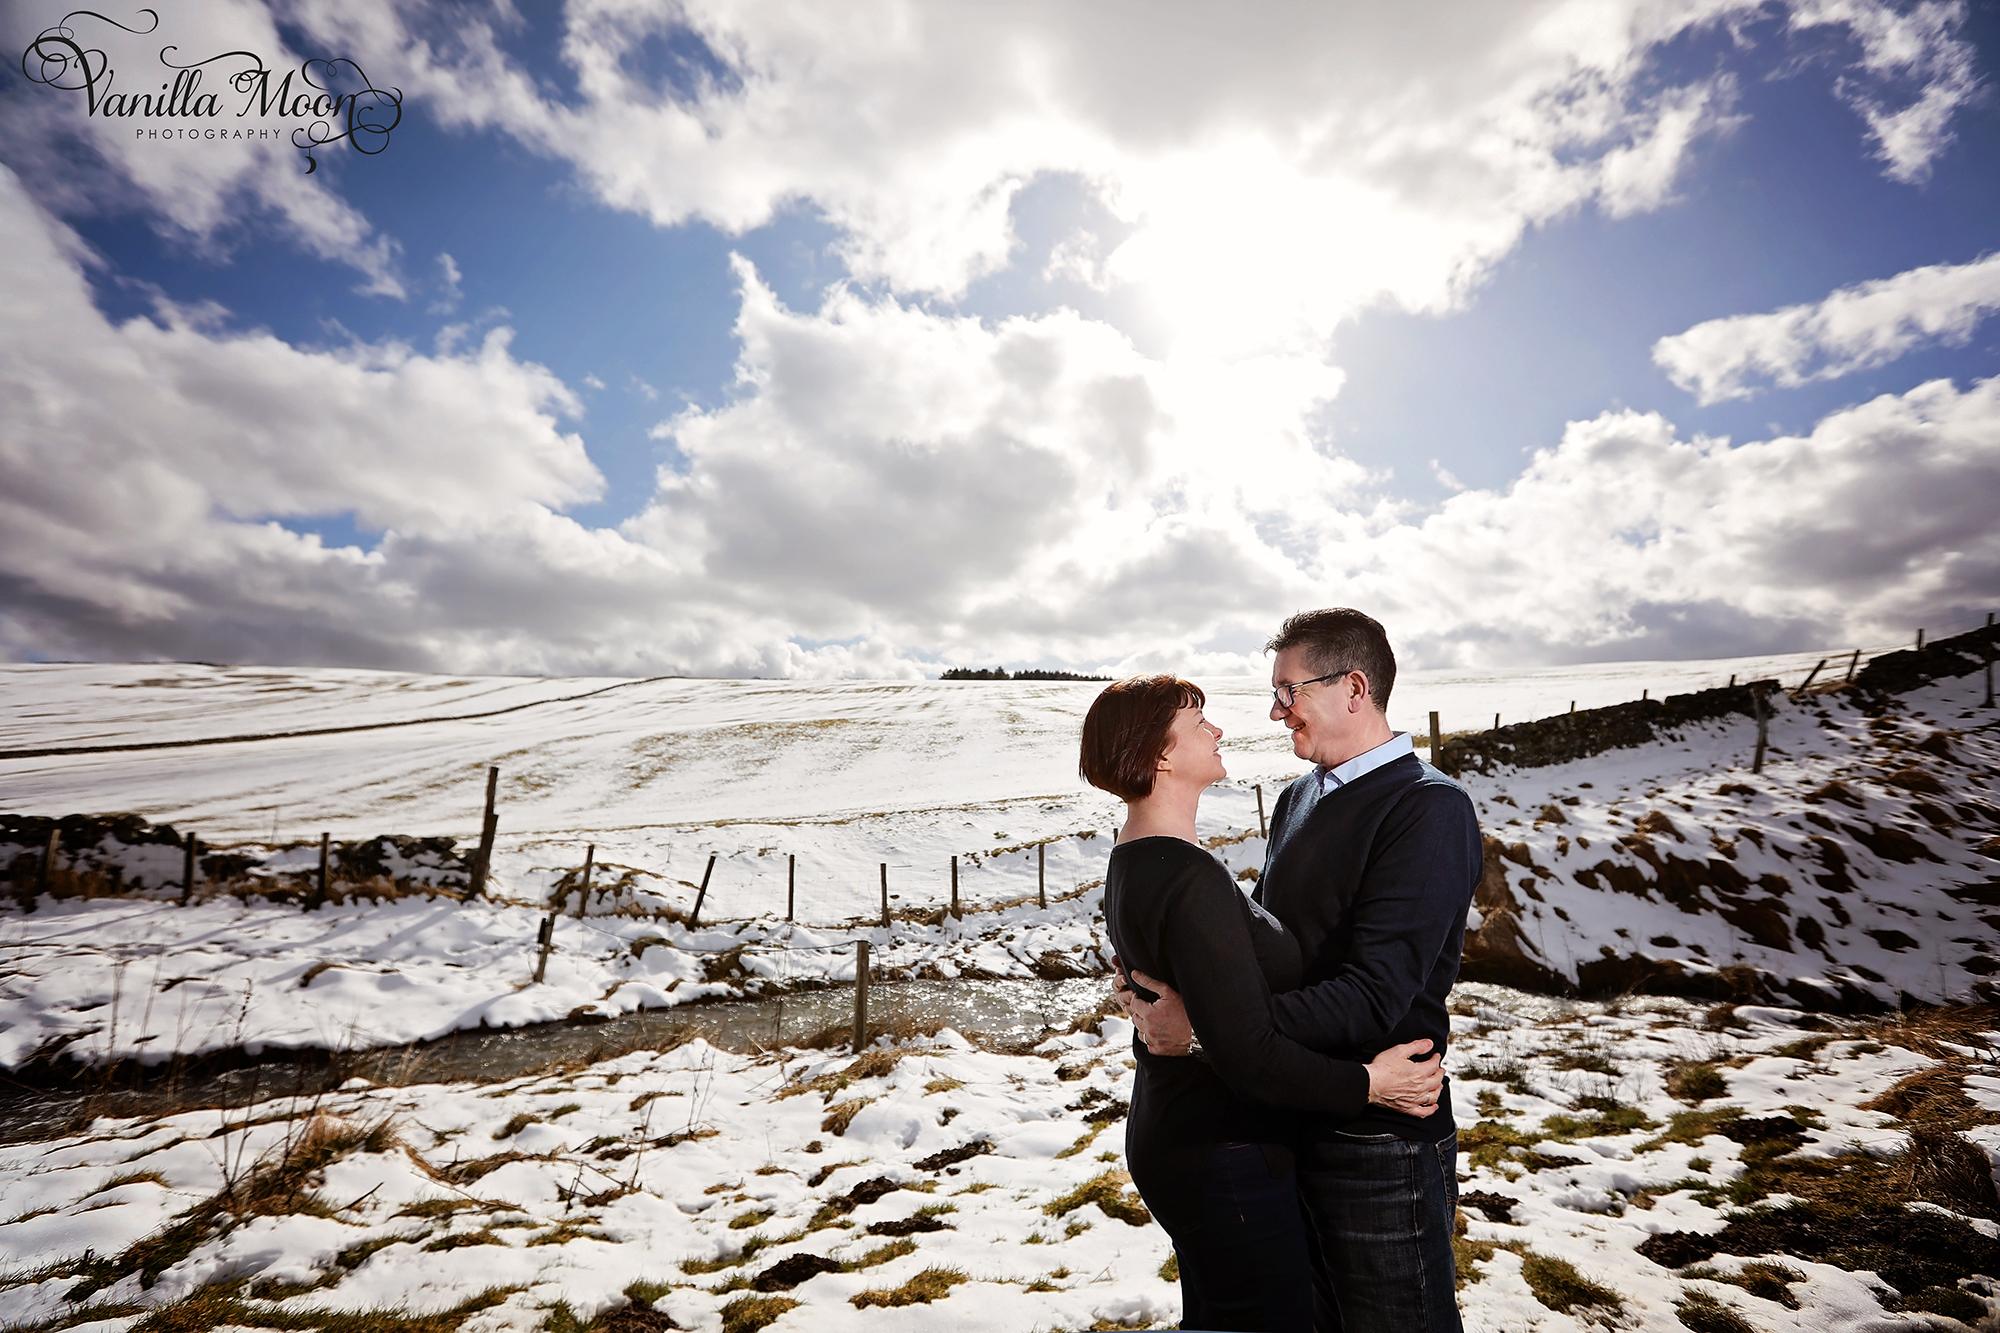 Snowy engagement photo shoot